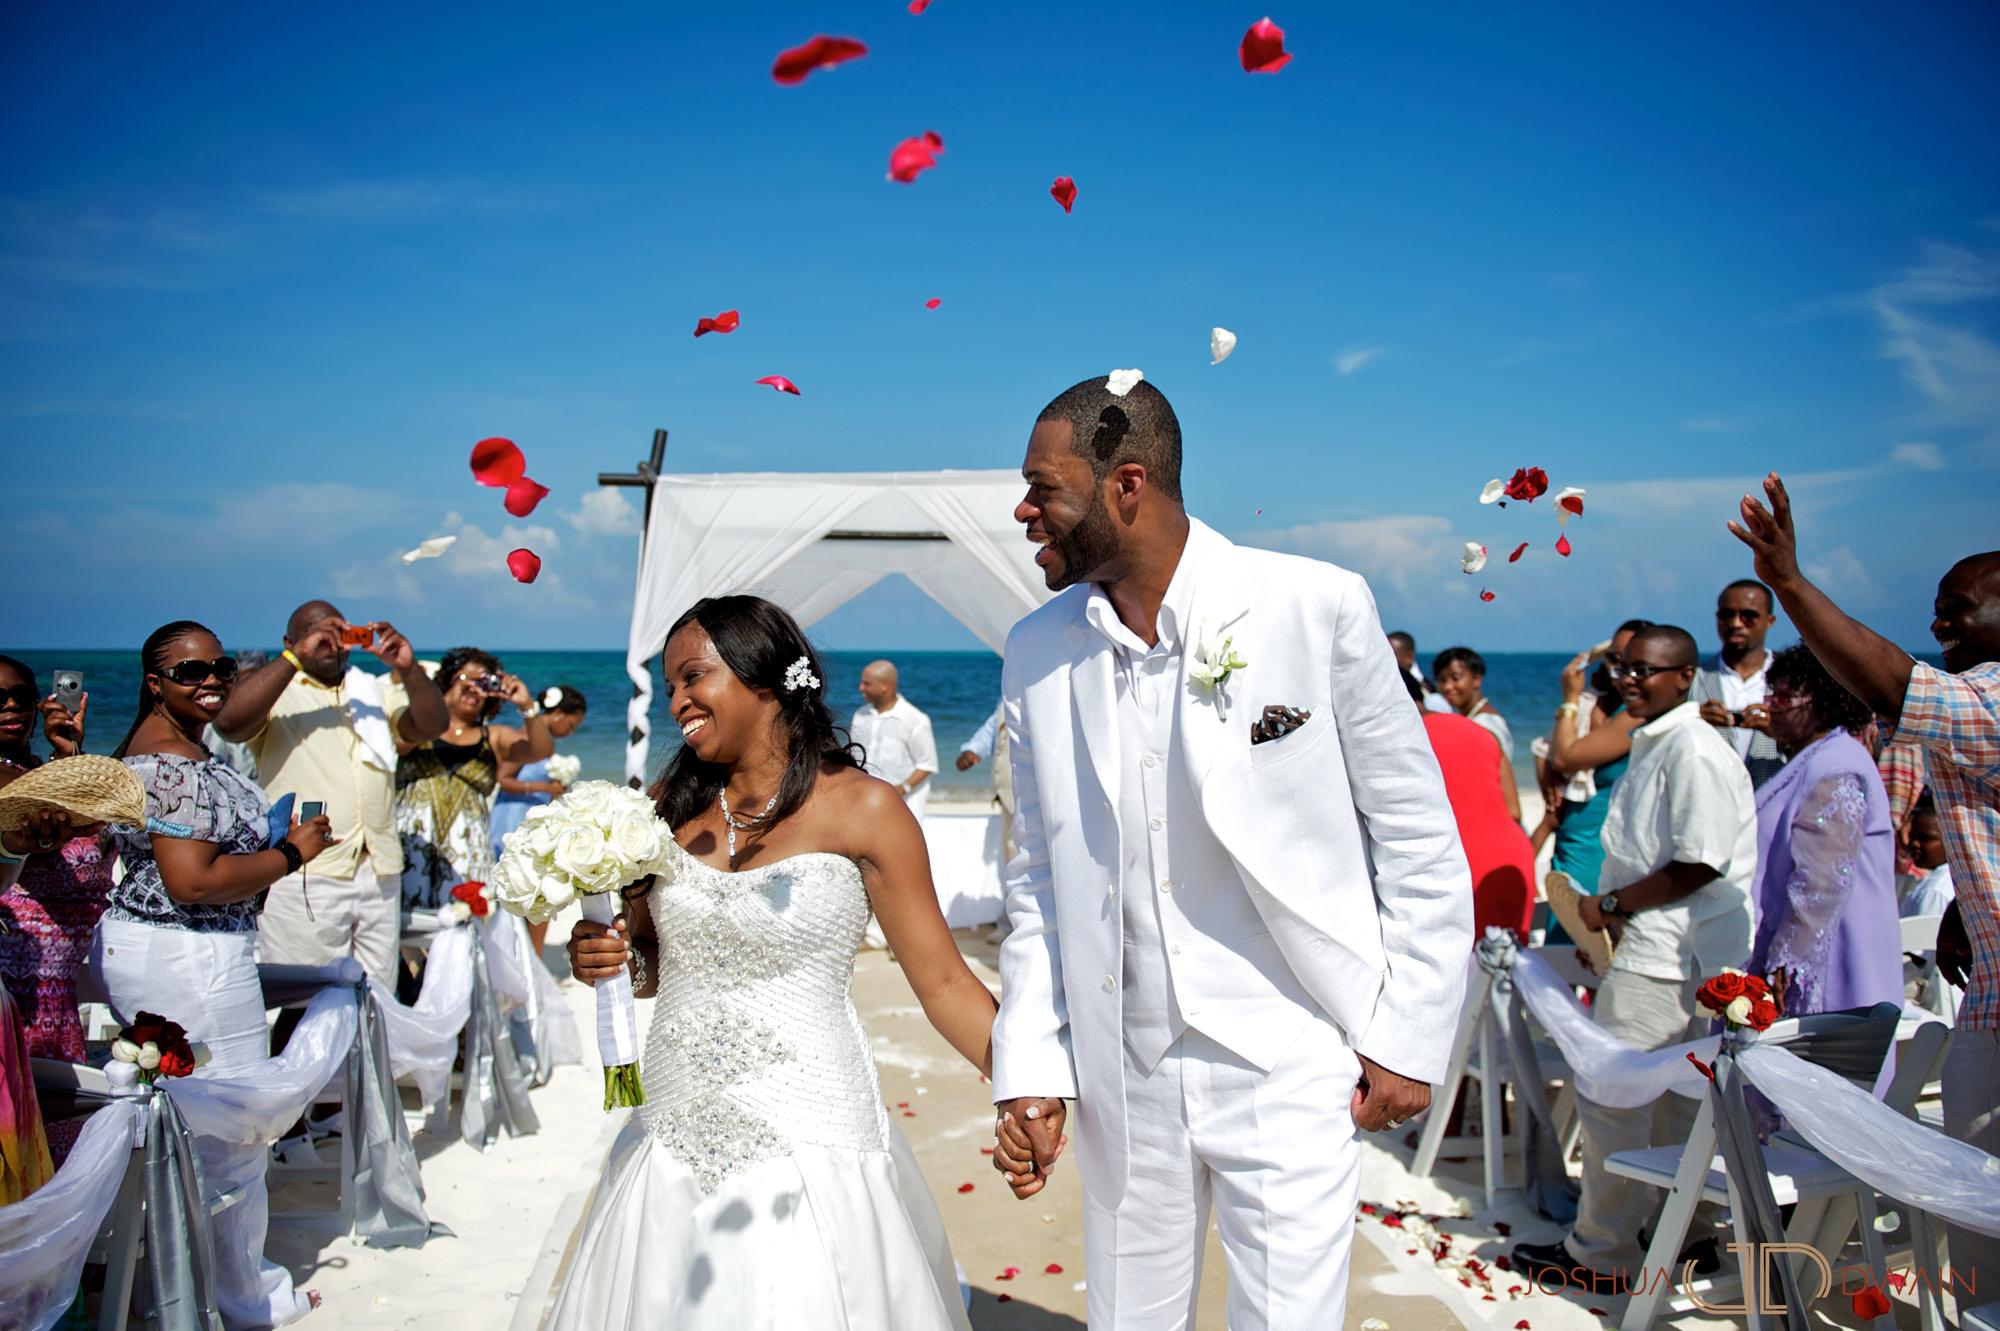 janet-adrian-014-hard-rock-cafe-riveria-maya-mexico-wedding-photographer-joshua-dwain-janet-adrian-014-hard-rock-cafe-riveria-maya-wedding-photographer-joshua-dwain-2011-07-22_ja_354